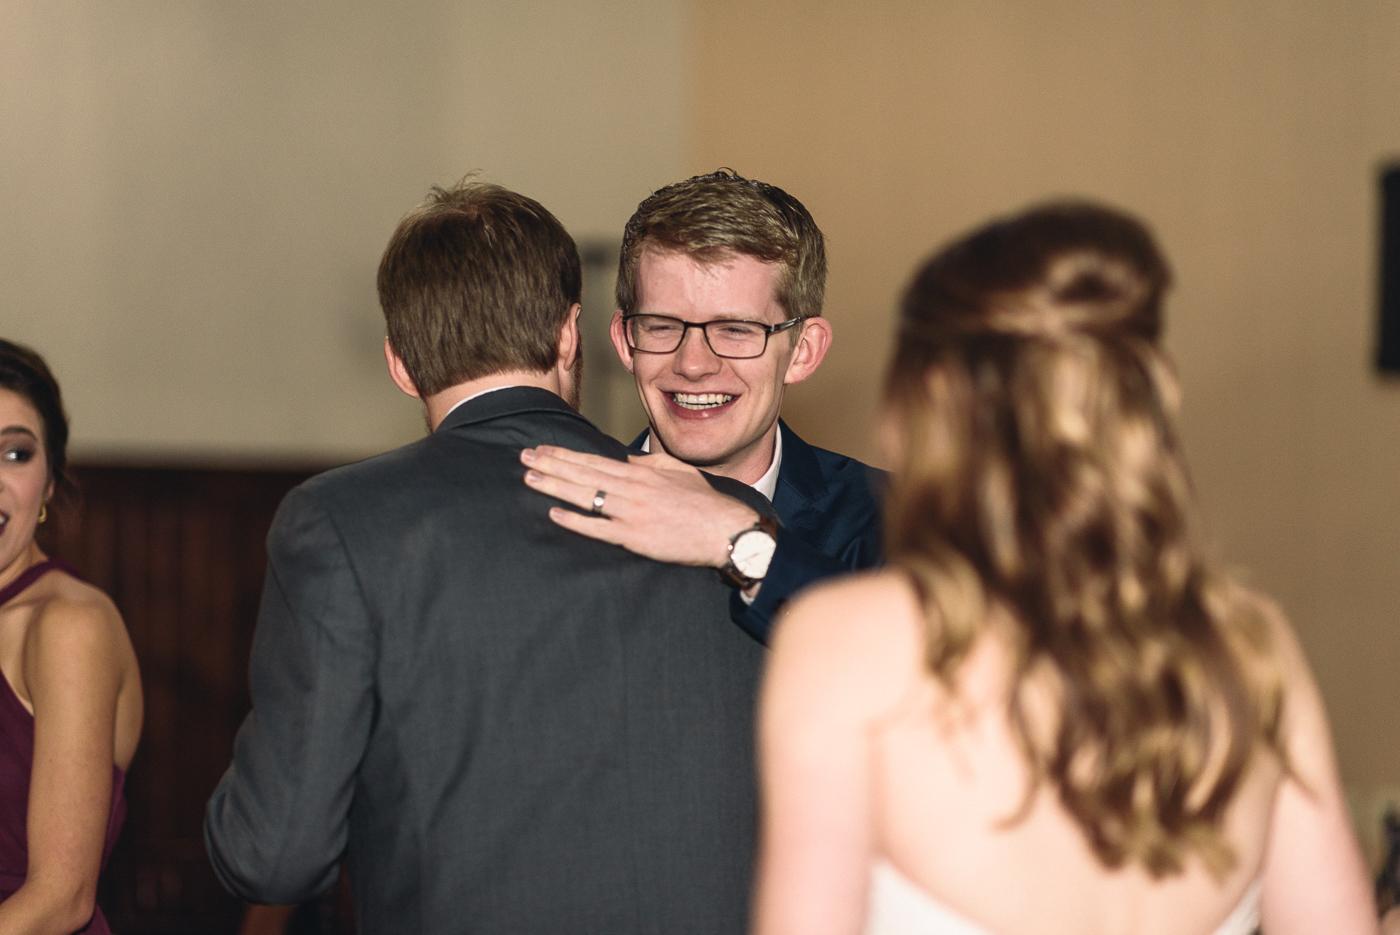 wedding reception hug groom cousins